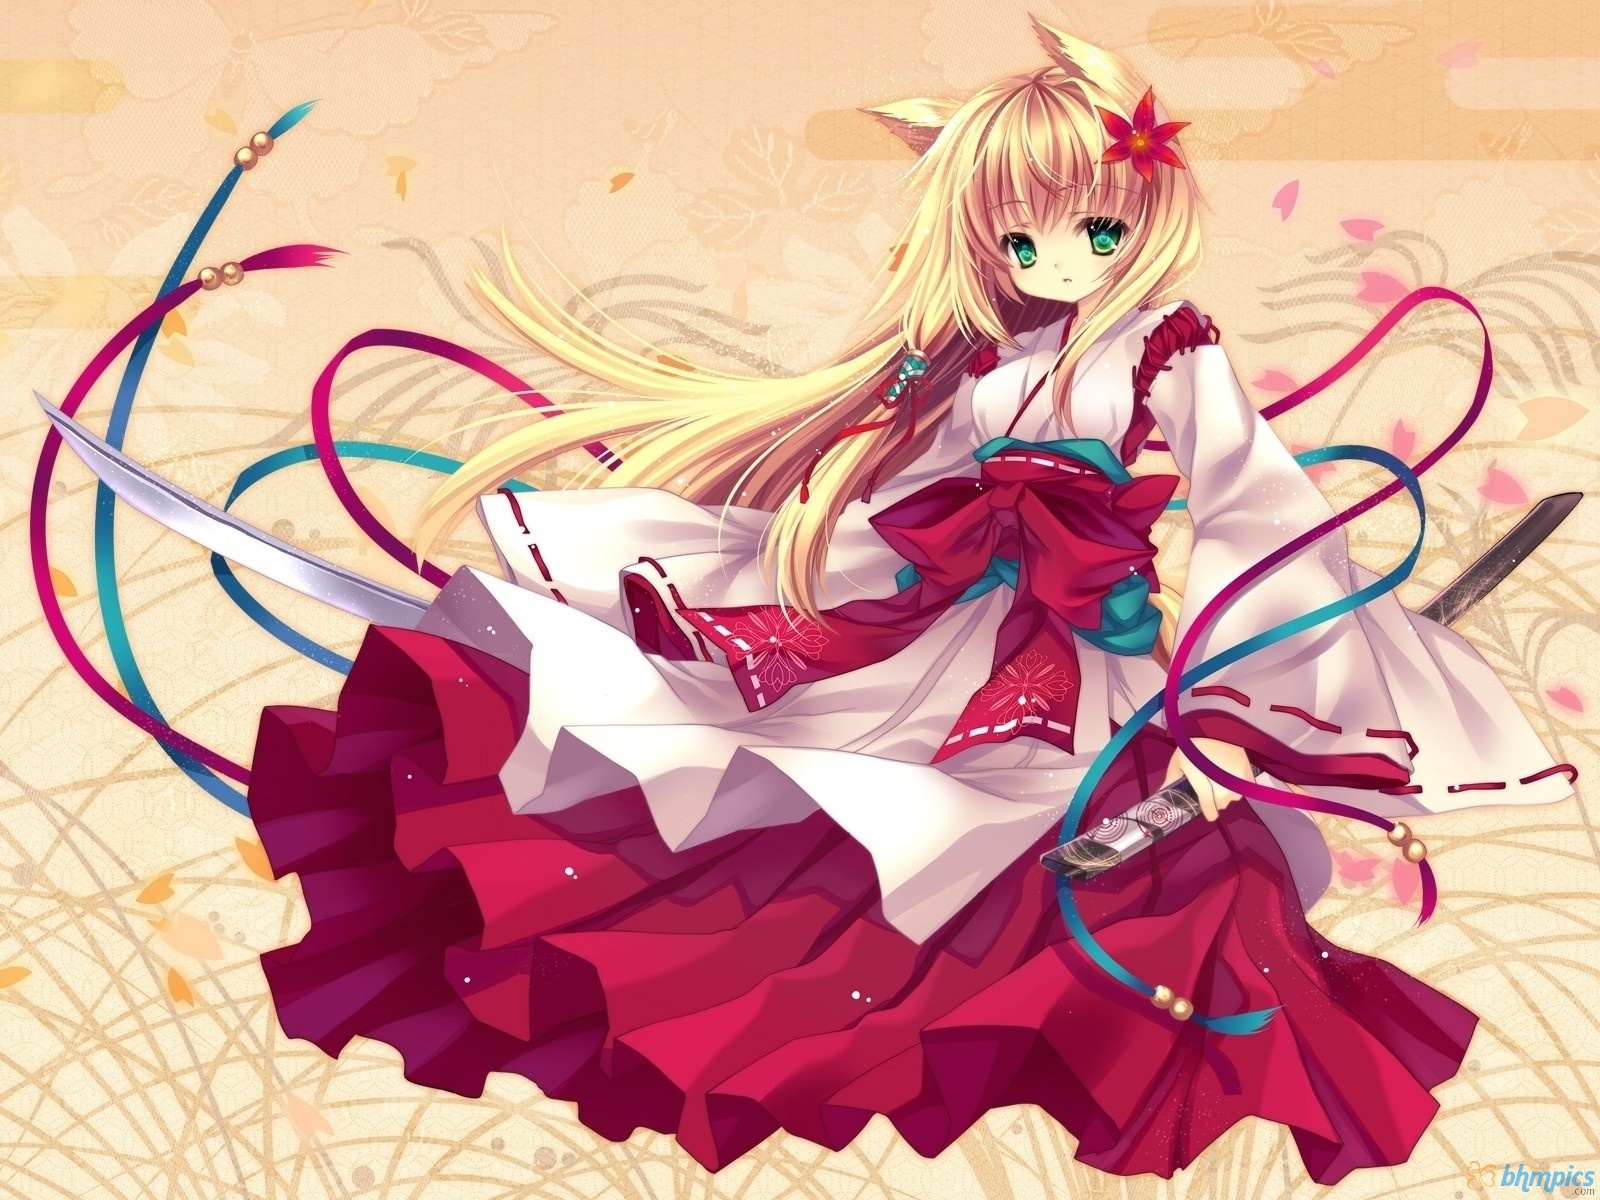 kawaii anime wallpaper - wallpapersafari